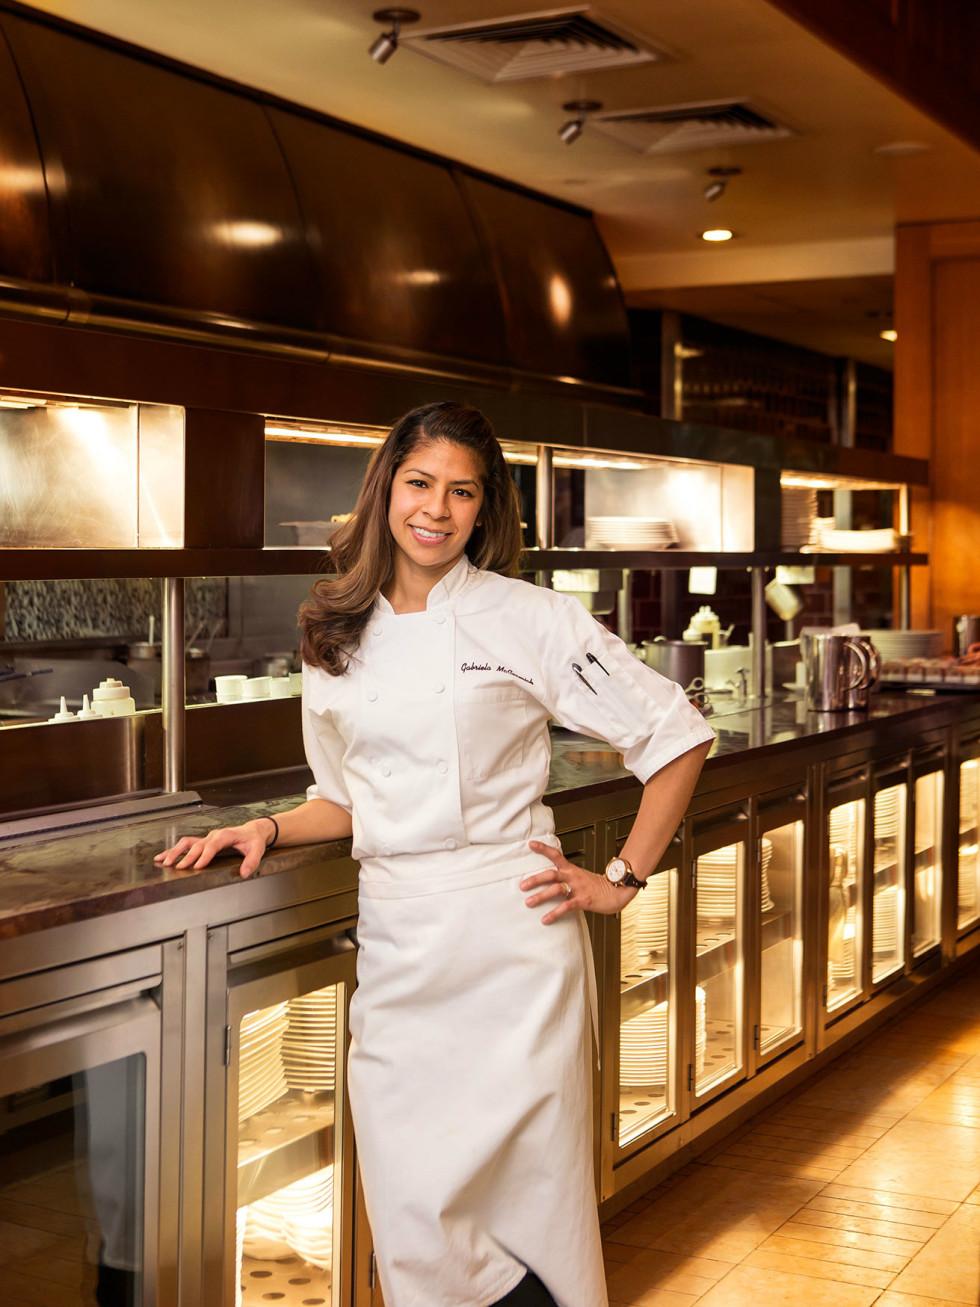 Chef Gabriela McCormick of Fearing's restaurant in Dallas